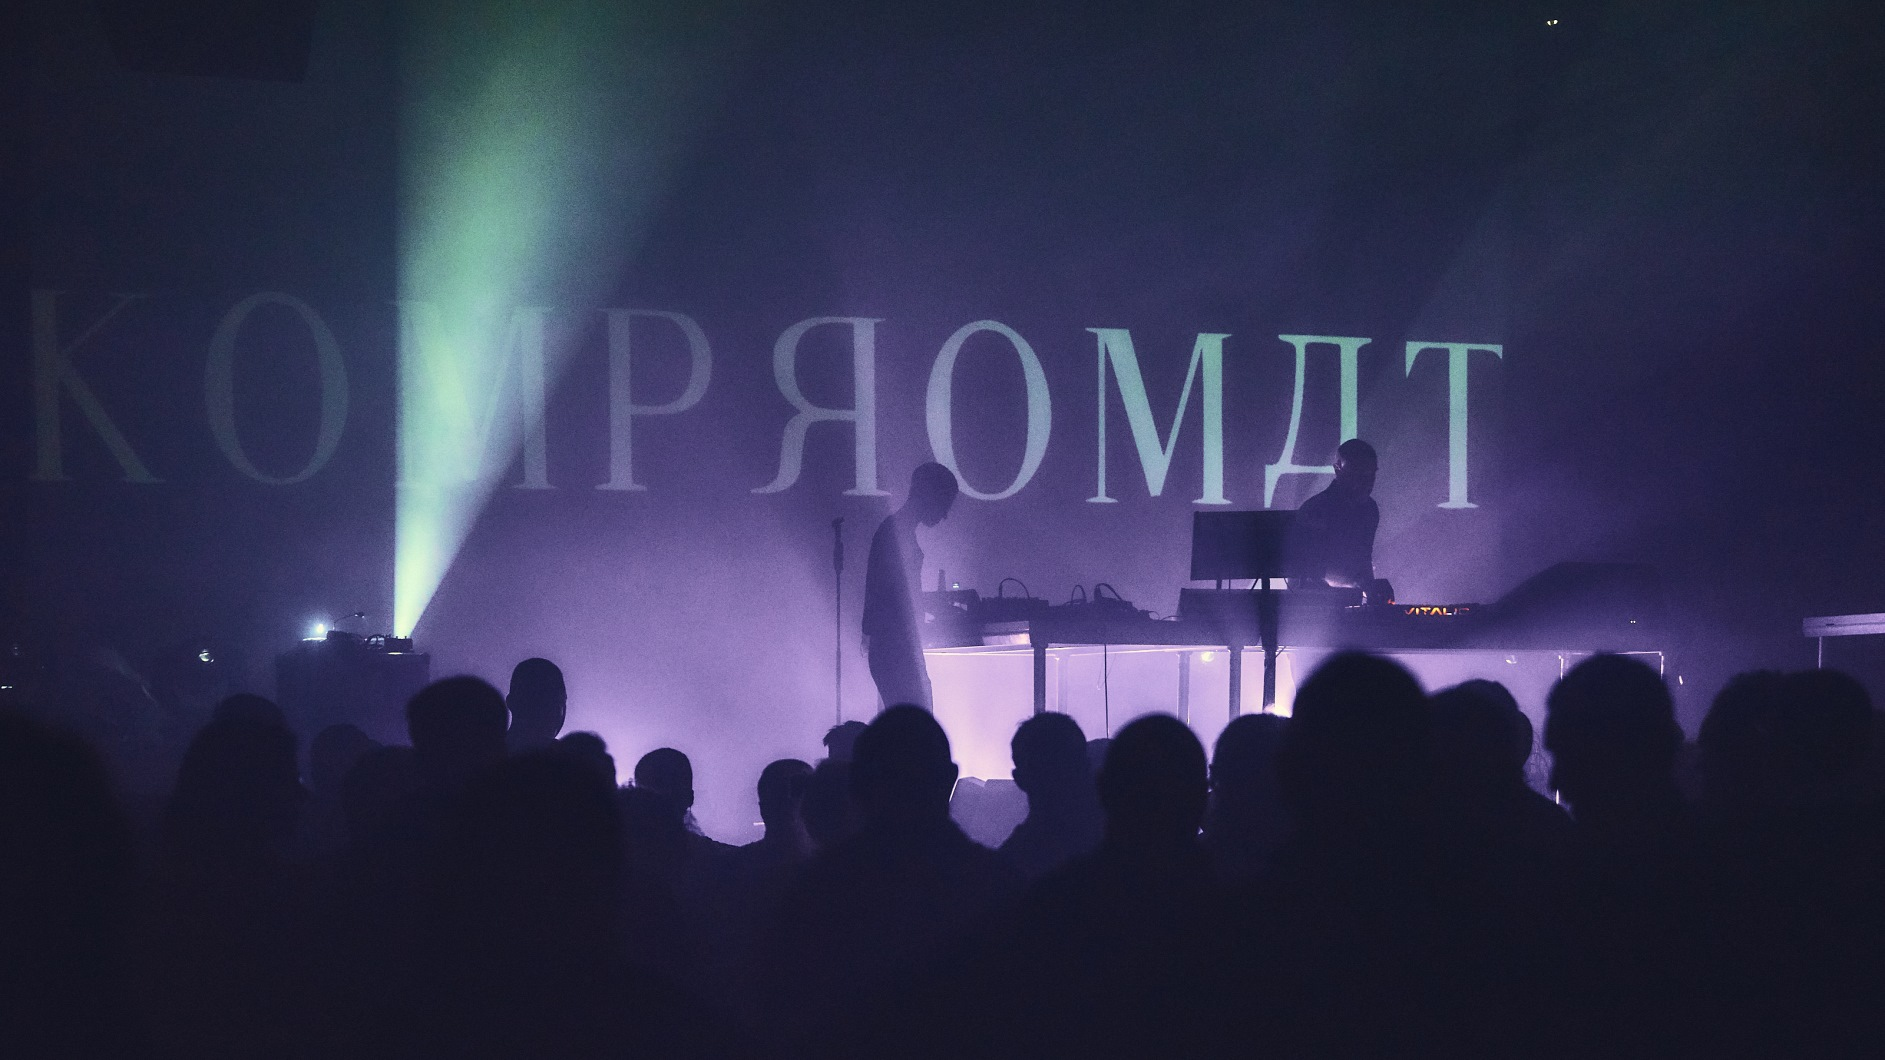 Mizuki-Kompromat27.jpg